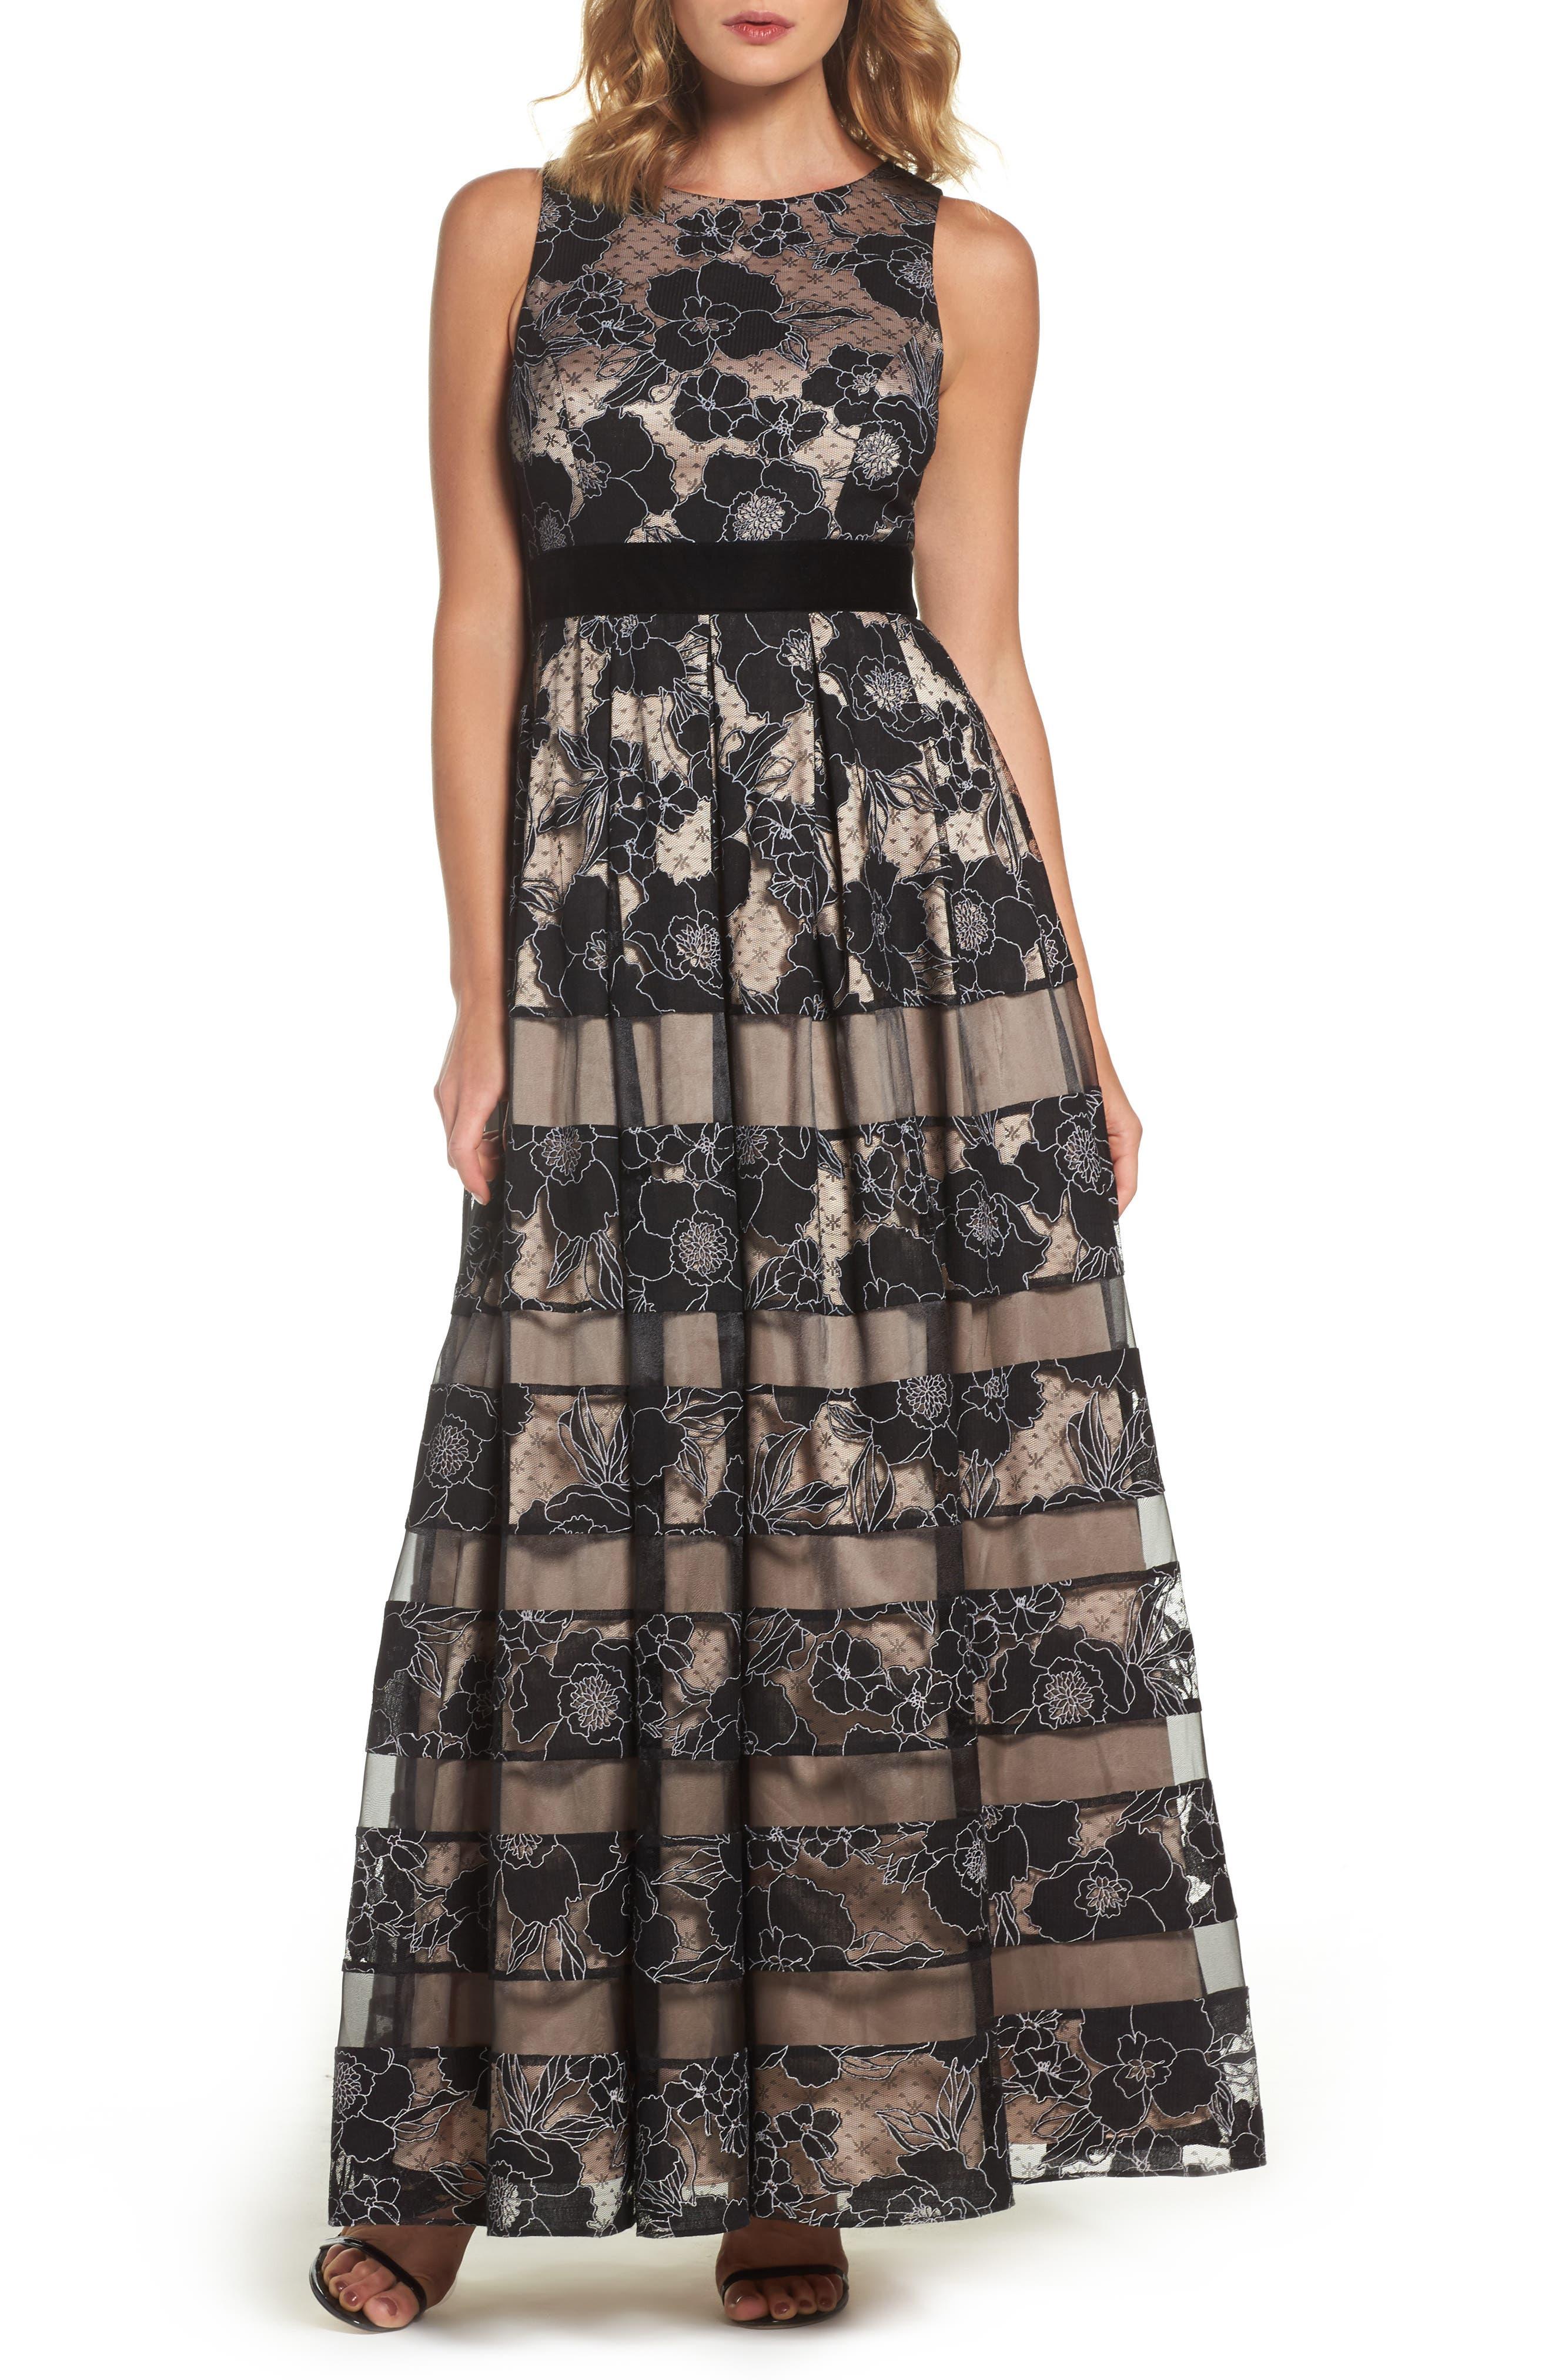 Inset Waist Panel Lace Ballgown,                         Main,                         color, Black/ Tan